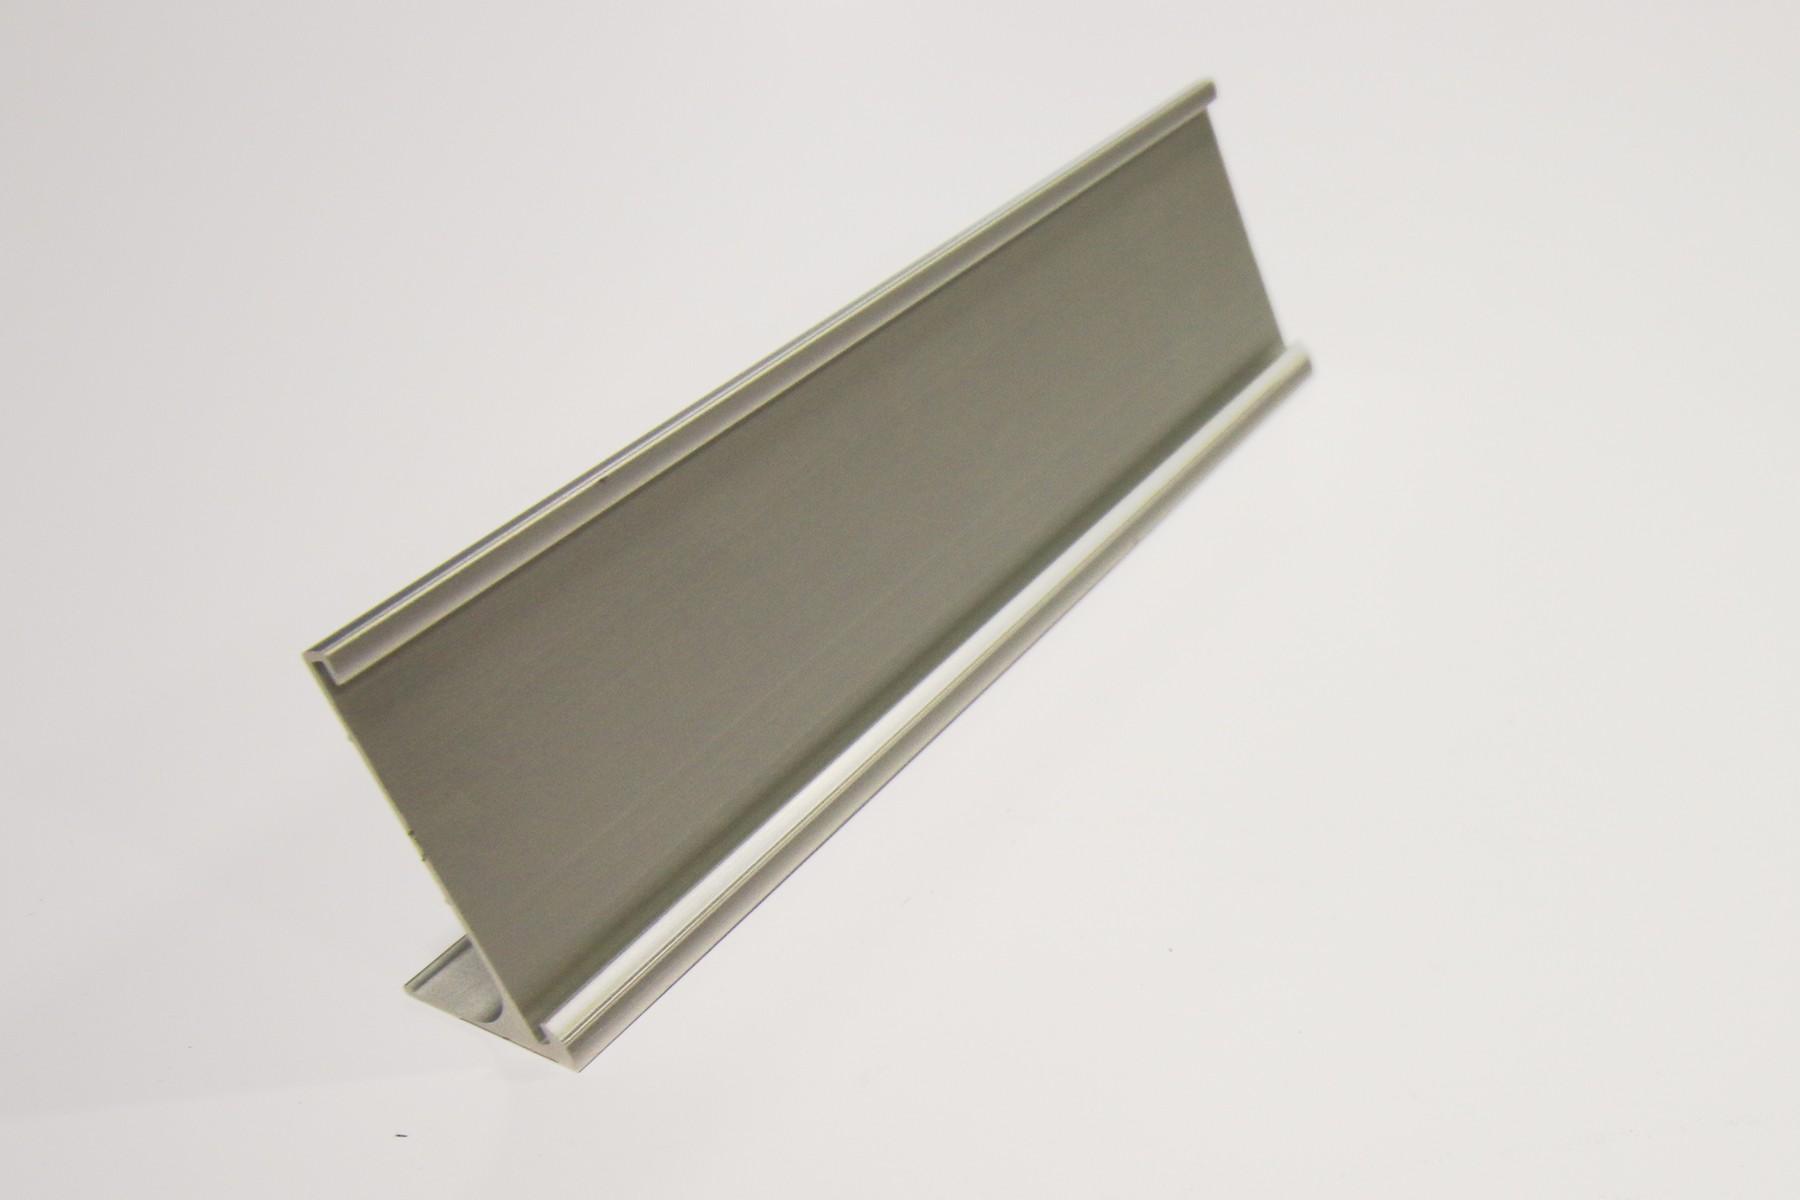 2 x 8 Desk Holders Satin Silver